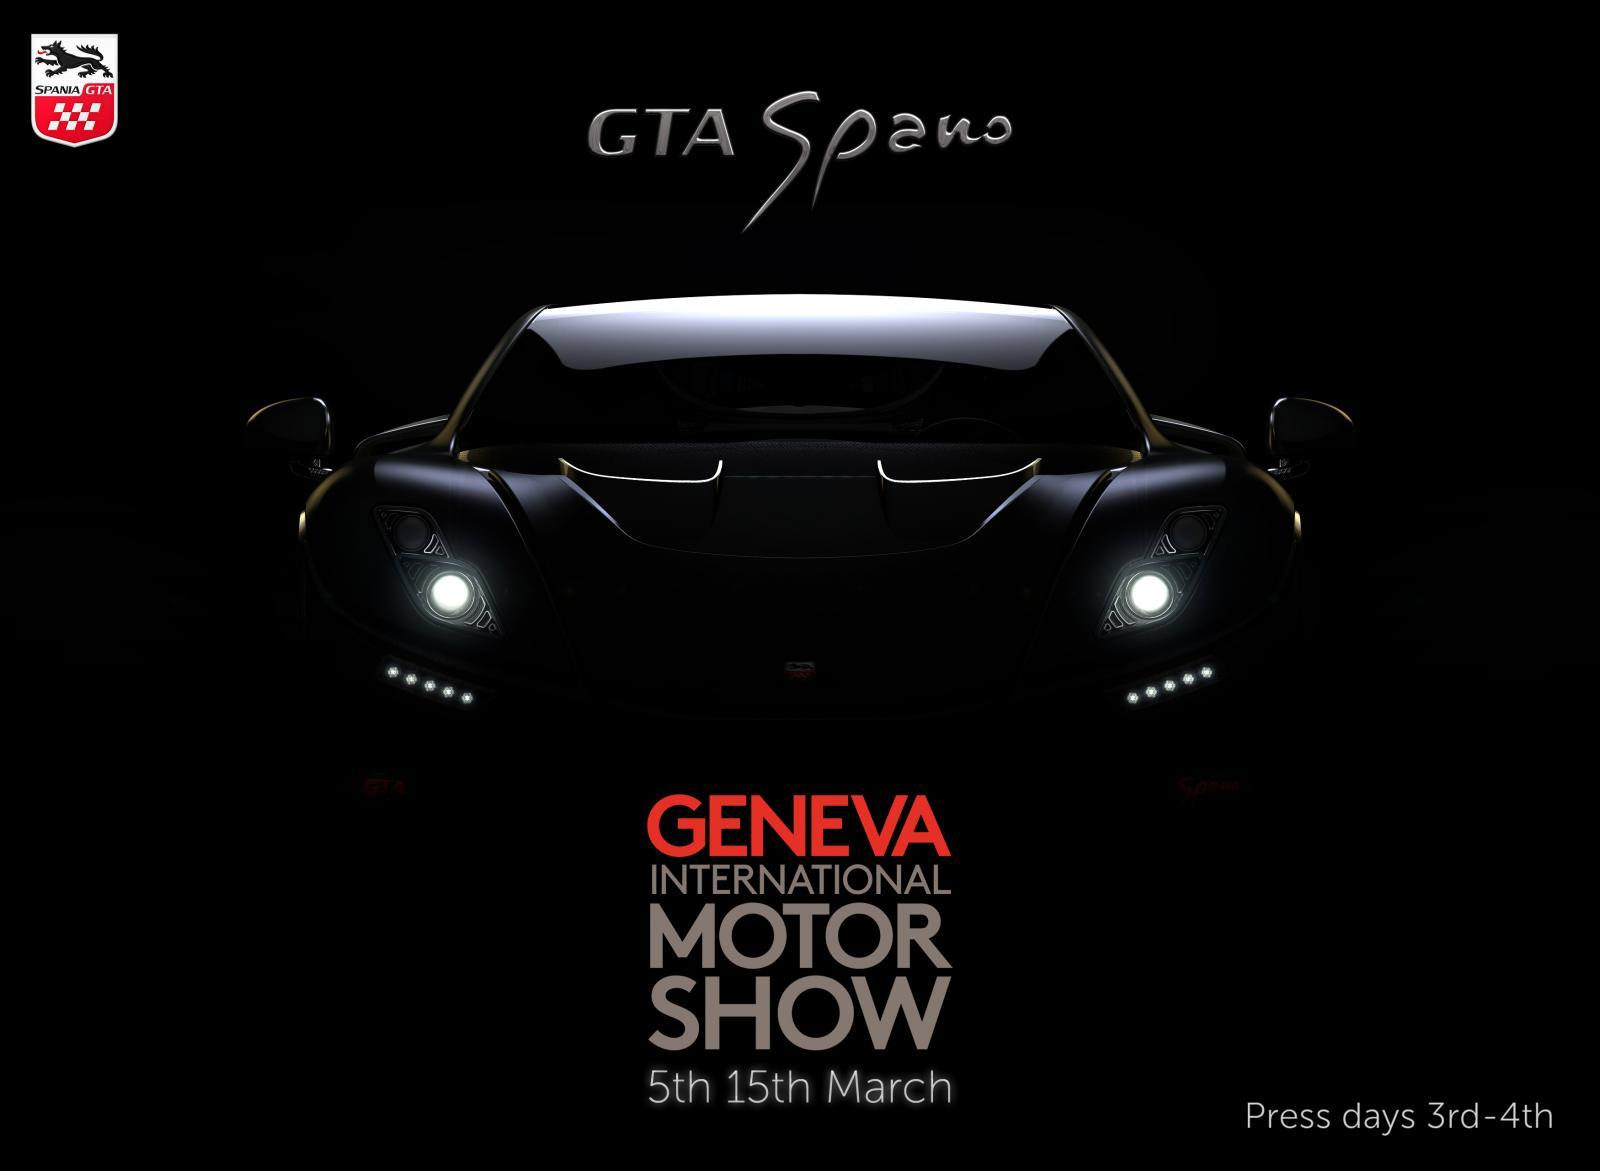 gta-spano-2015-teaser-n2